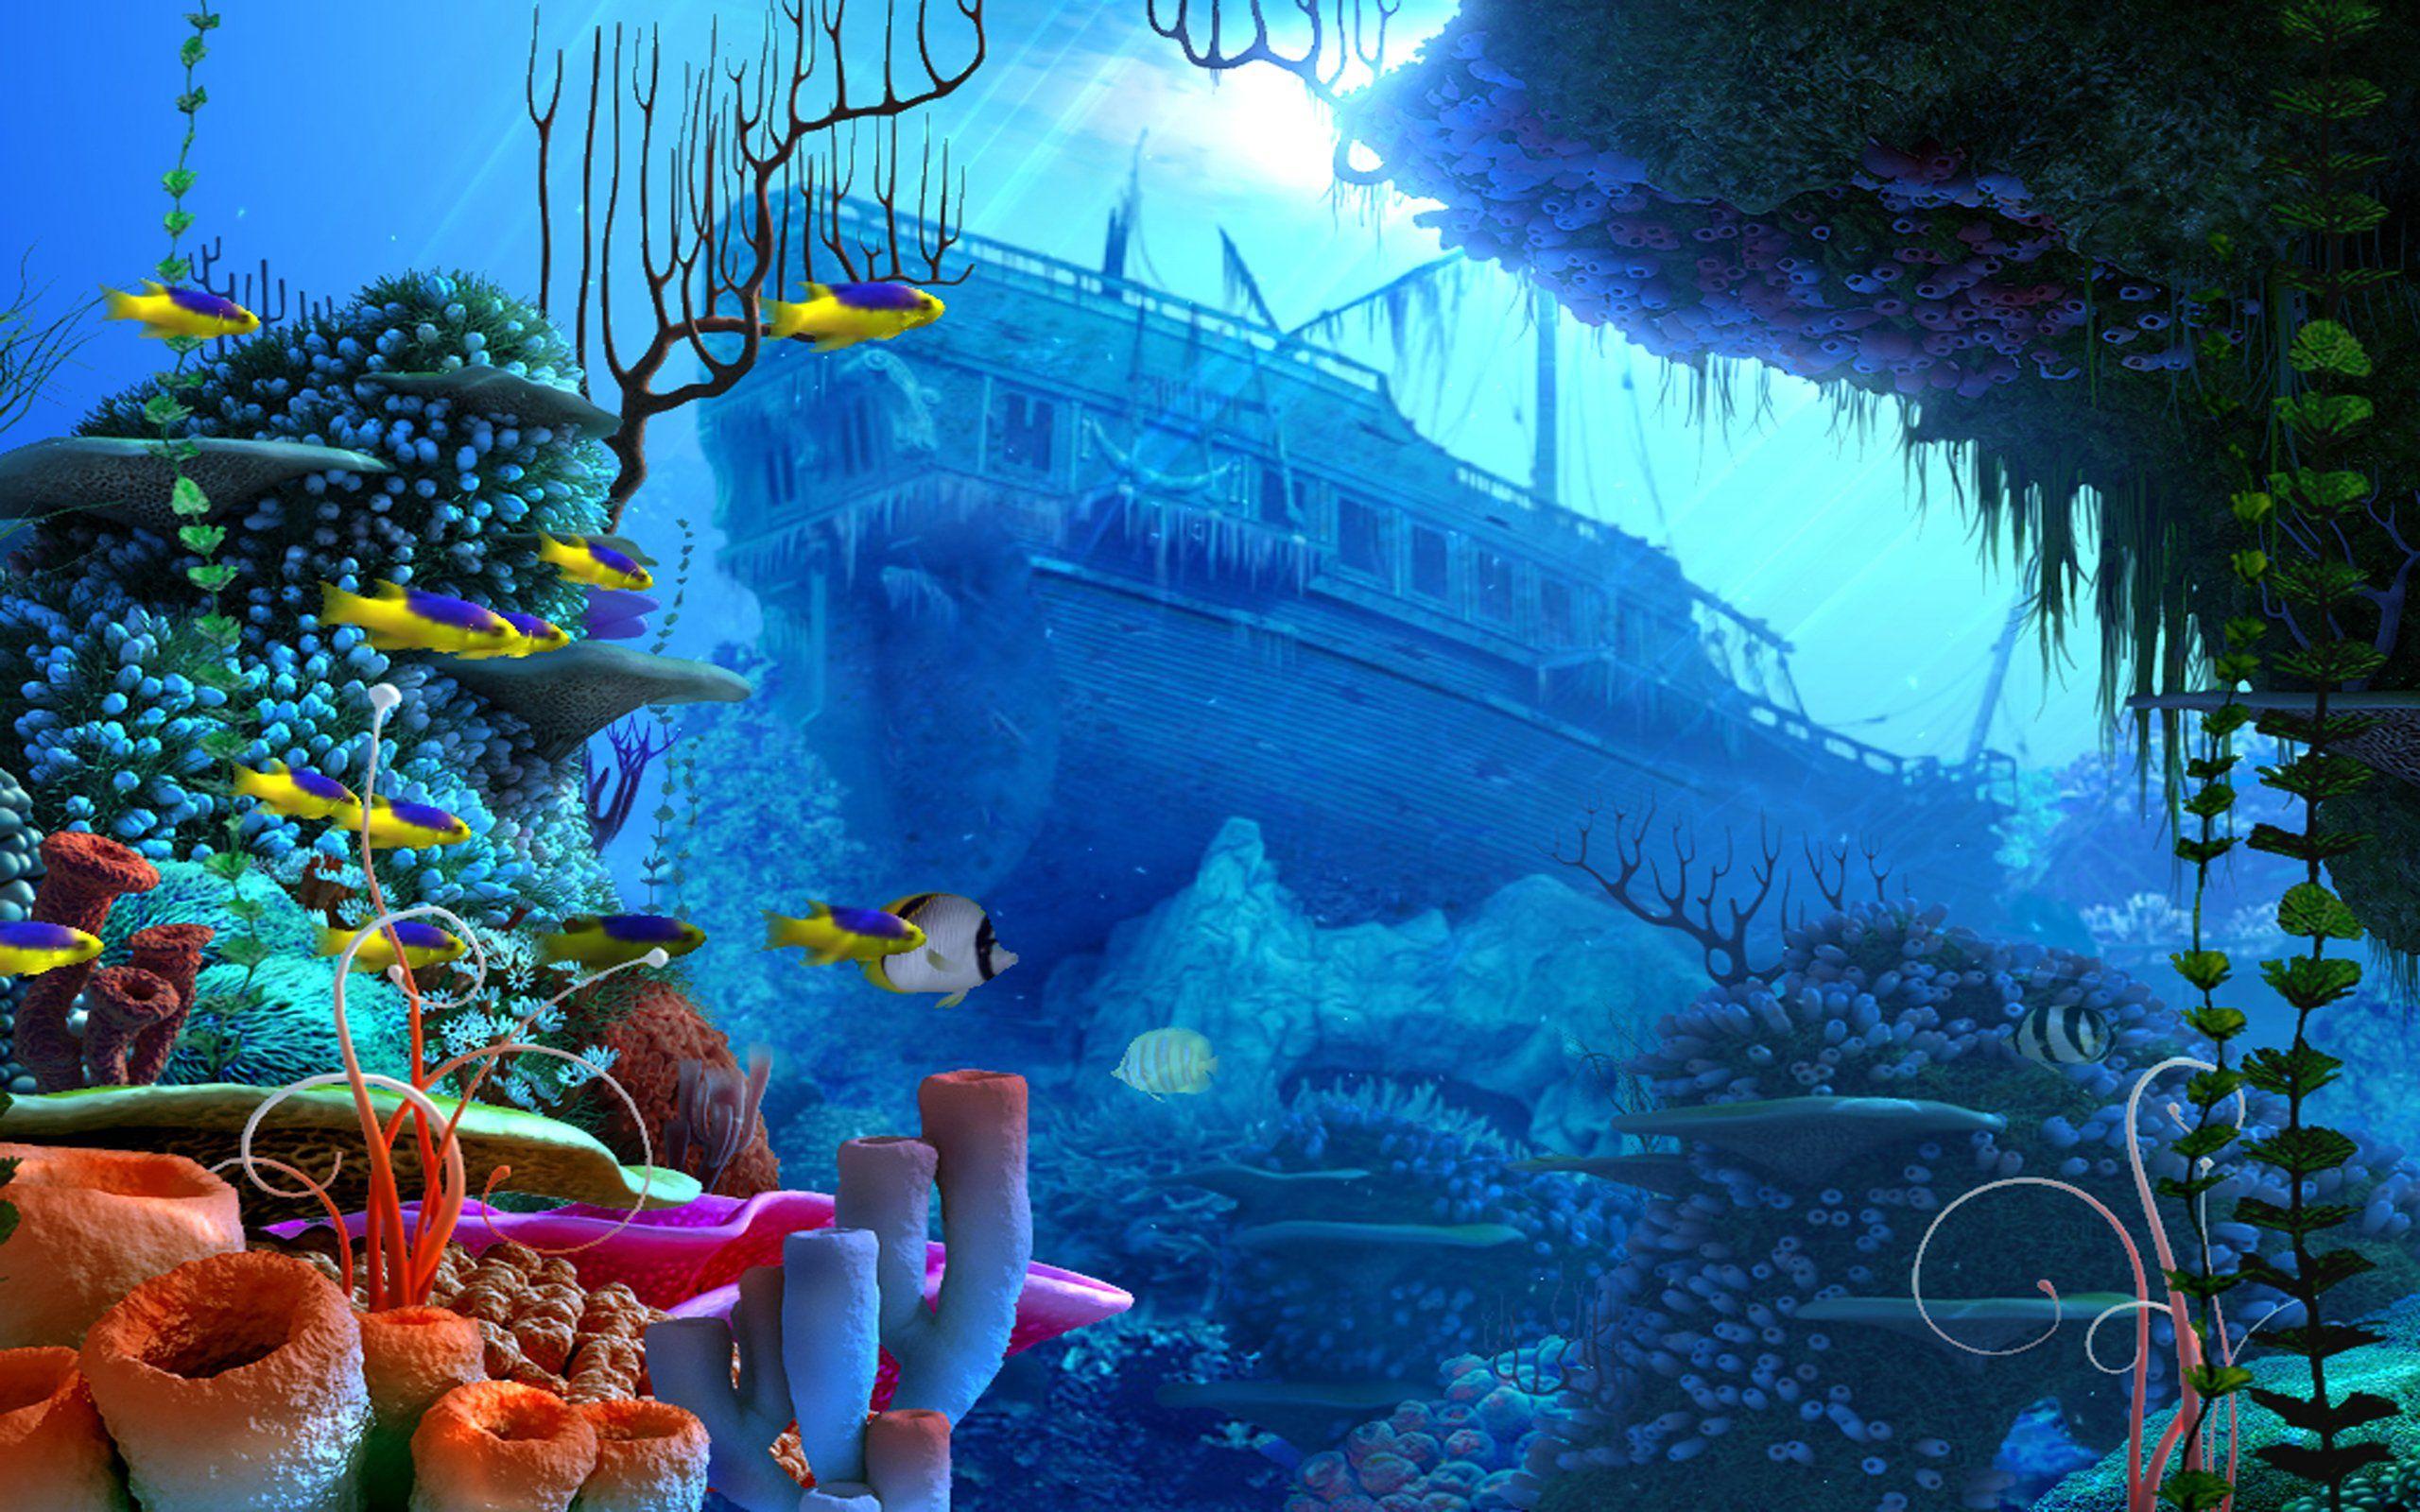 Underwater Reef Wallpaper For Android #GWS | Underwater ...